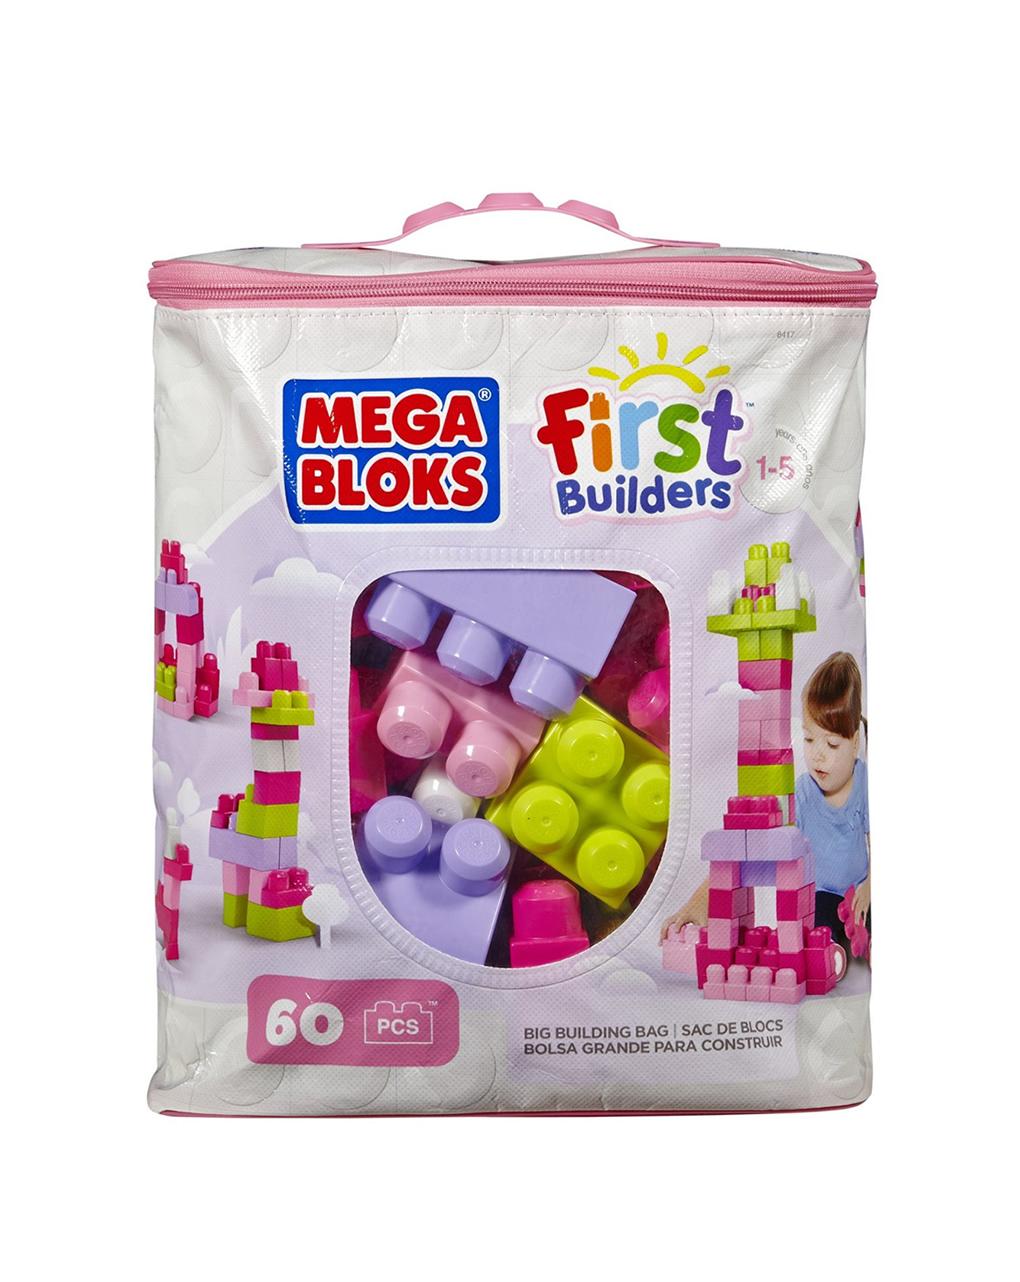 Mega bloks - bio bag 60 blocos de construção - Mega bloks